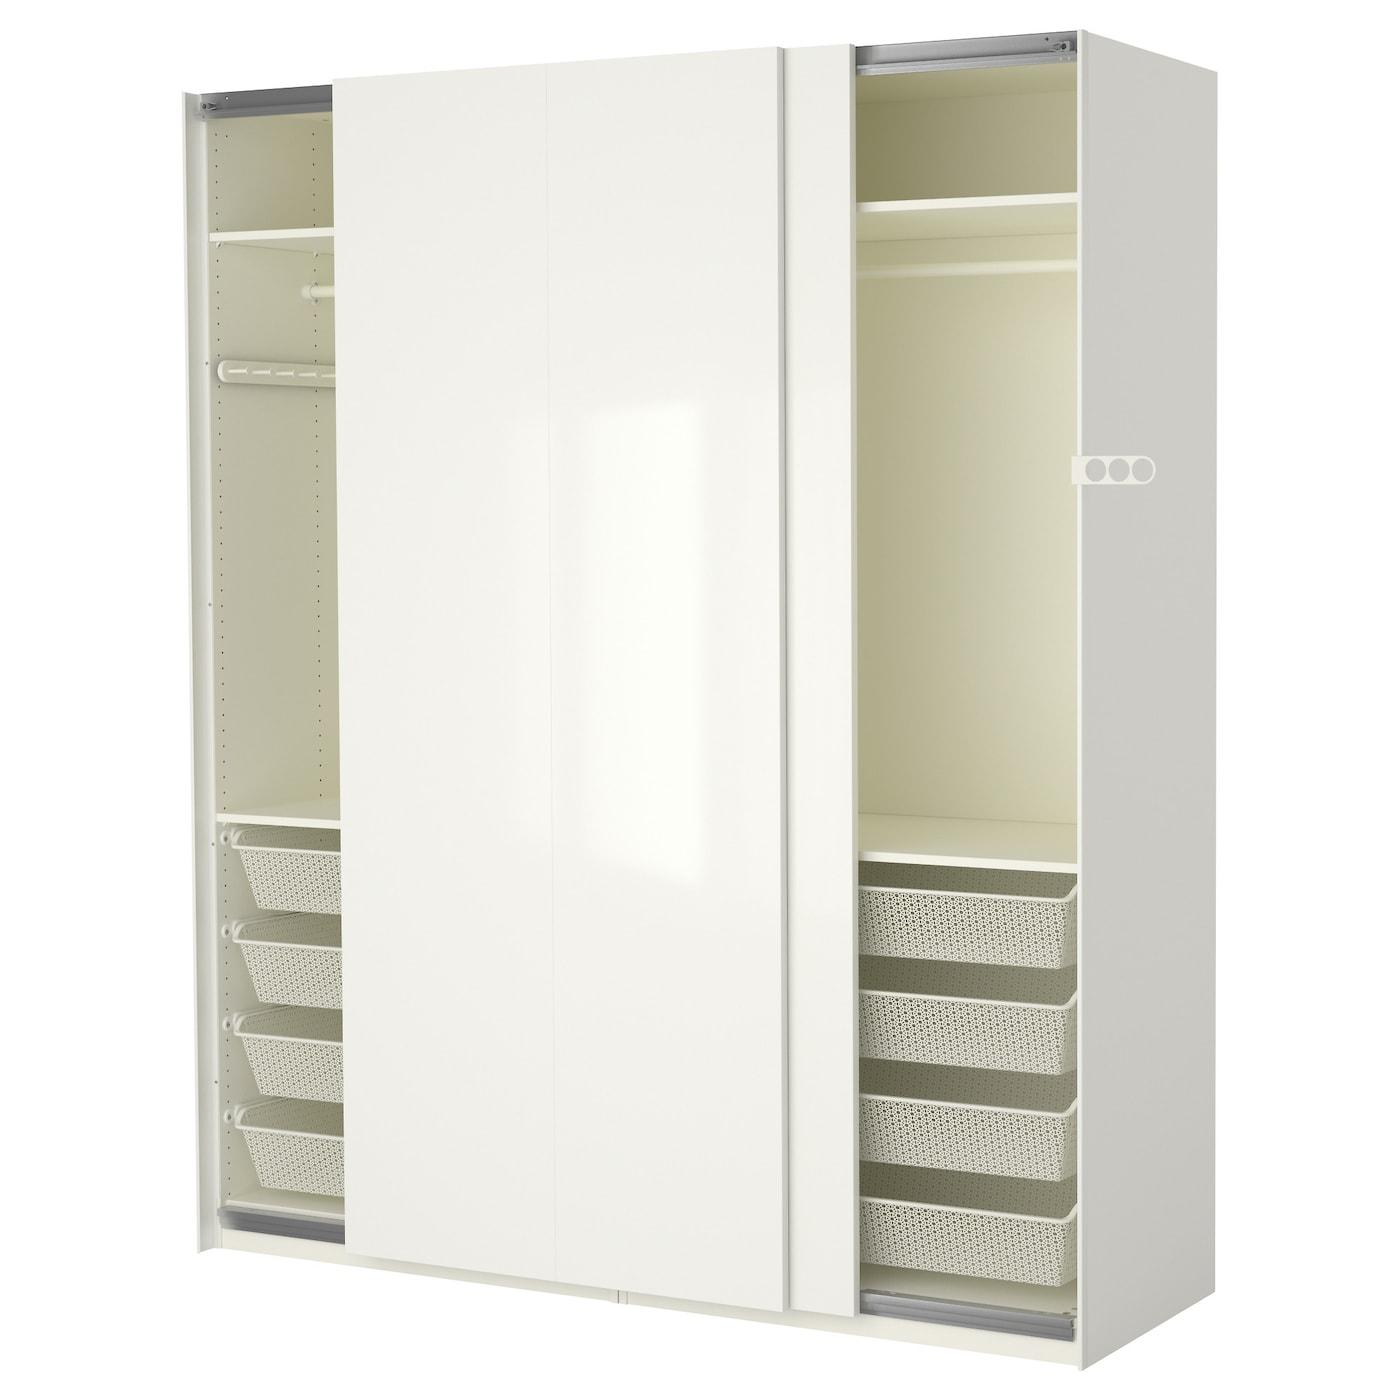 pax wardrobe white hasvik high gloss white 200x66x236 cm ikea. Black Bedroom Furniture Sets. Home Design Ideas